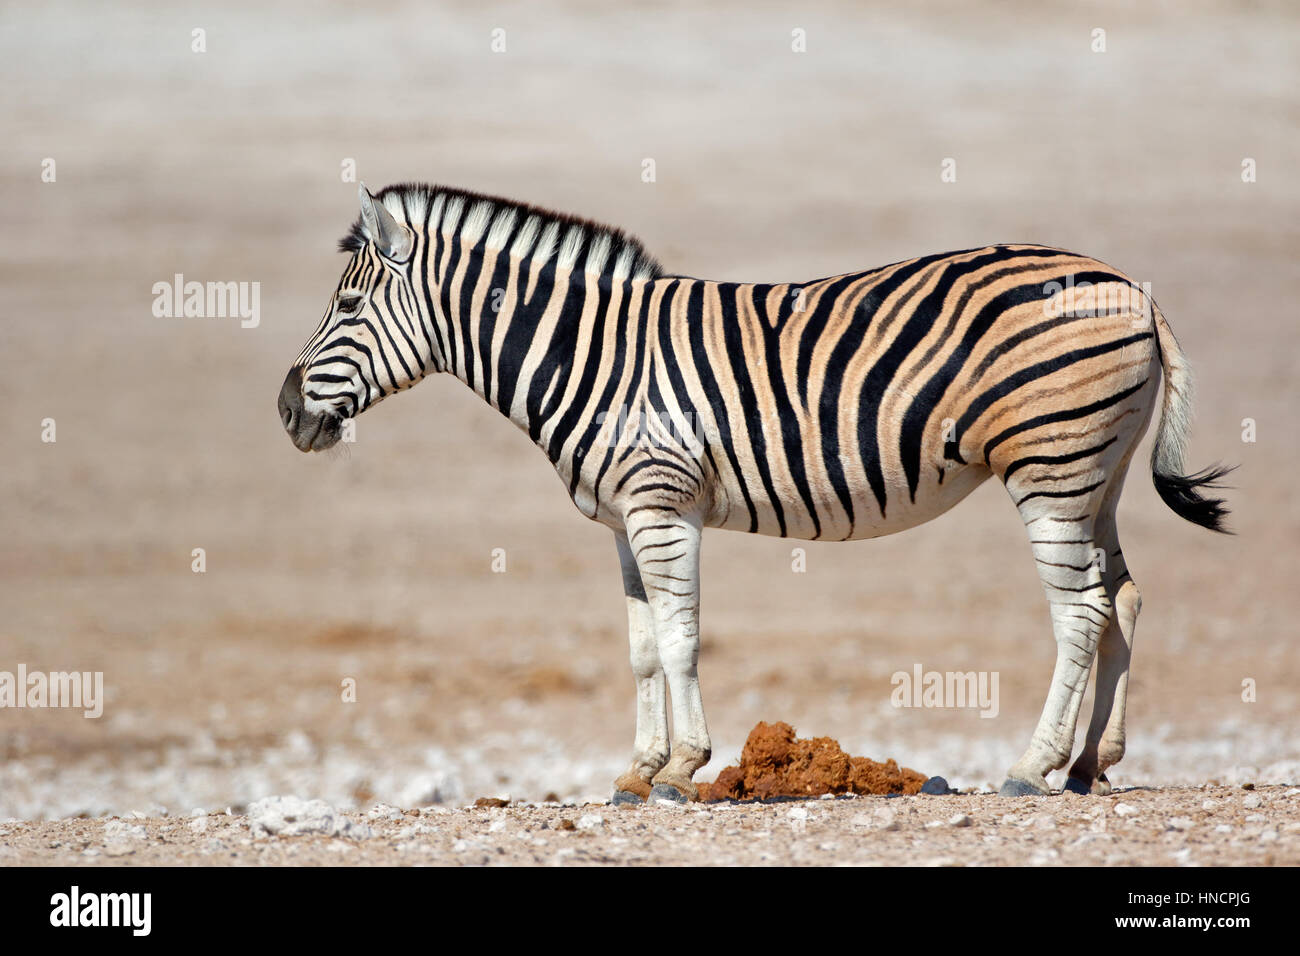 A plains (Burchells) zebra (Equus burchelli), Etosha National Park, Namibia - Stock Image